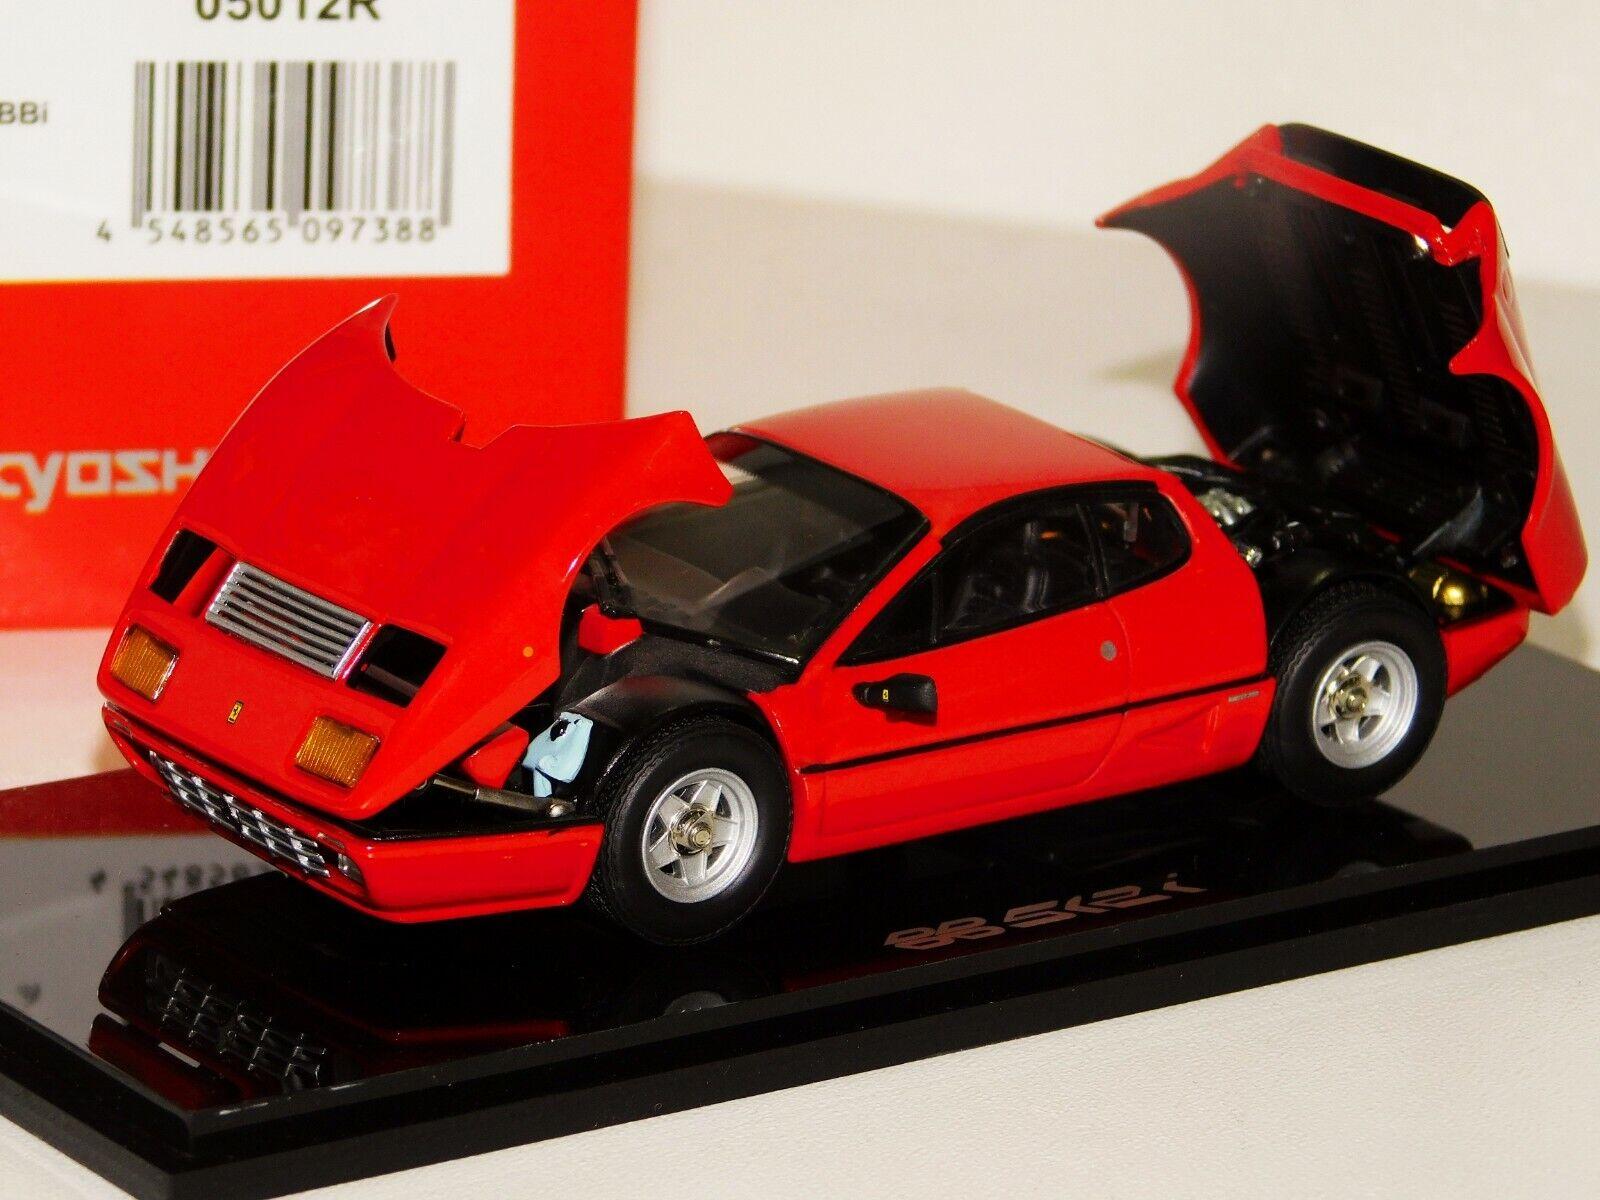 Ferrari 512bbi rojo inauguración kyosho 05012r 1  43